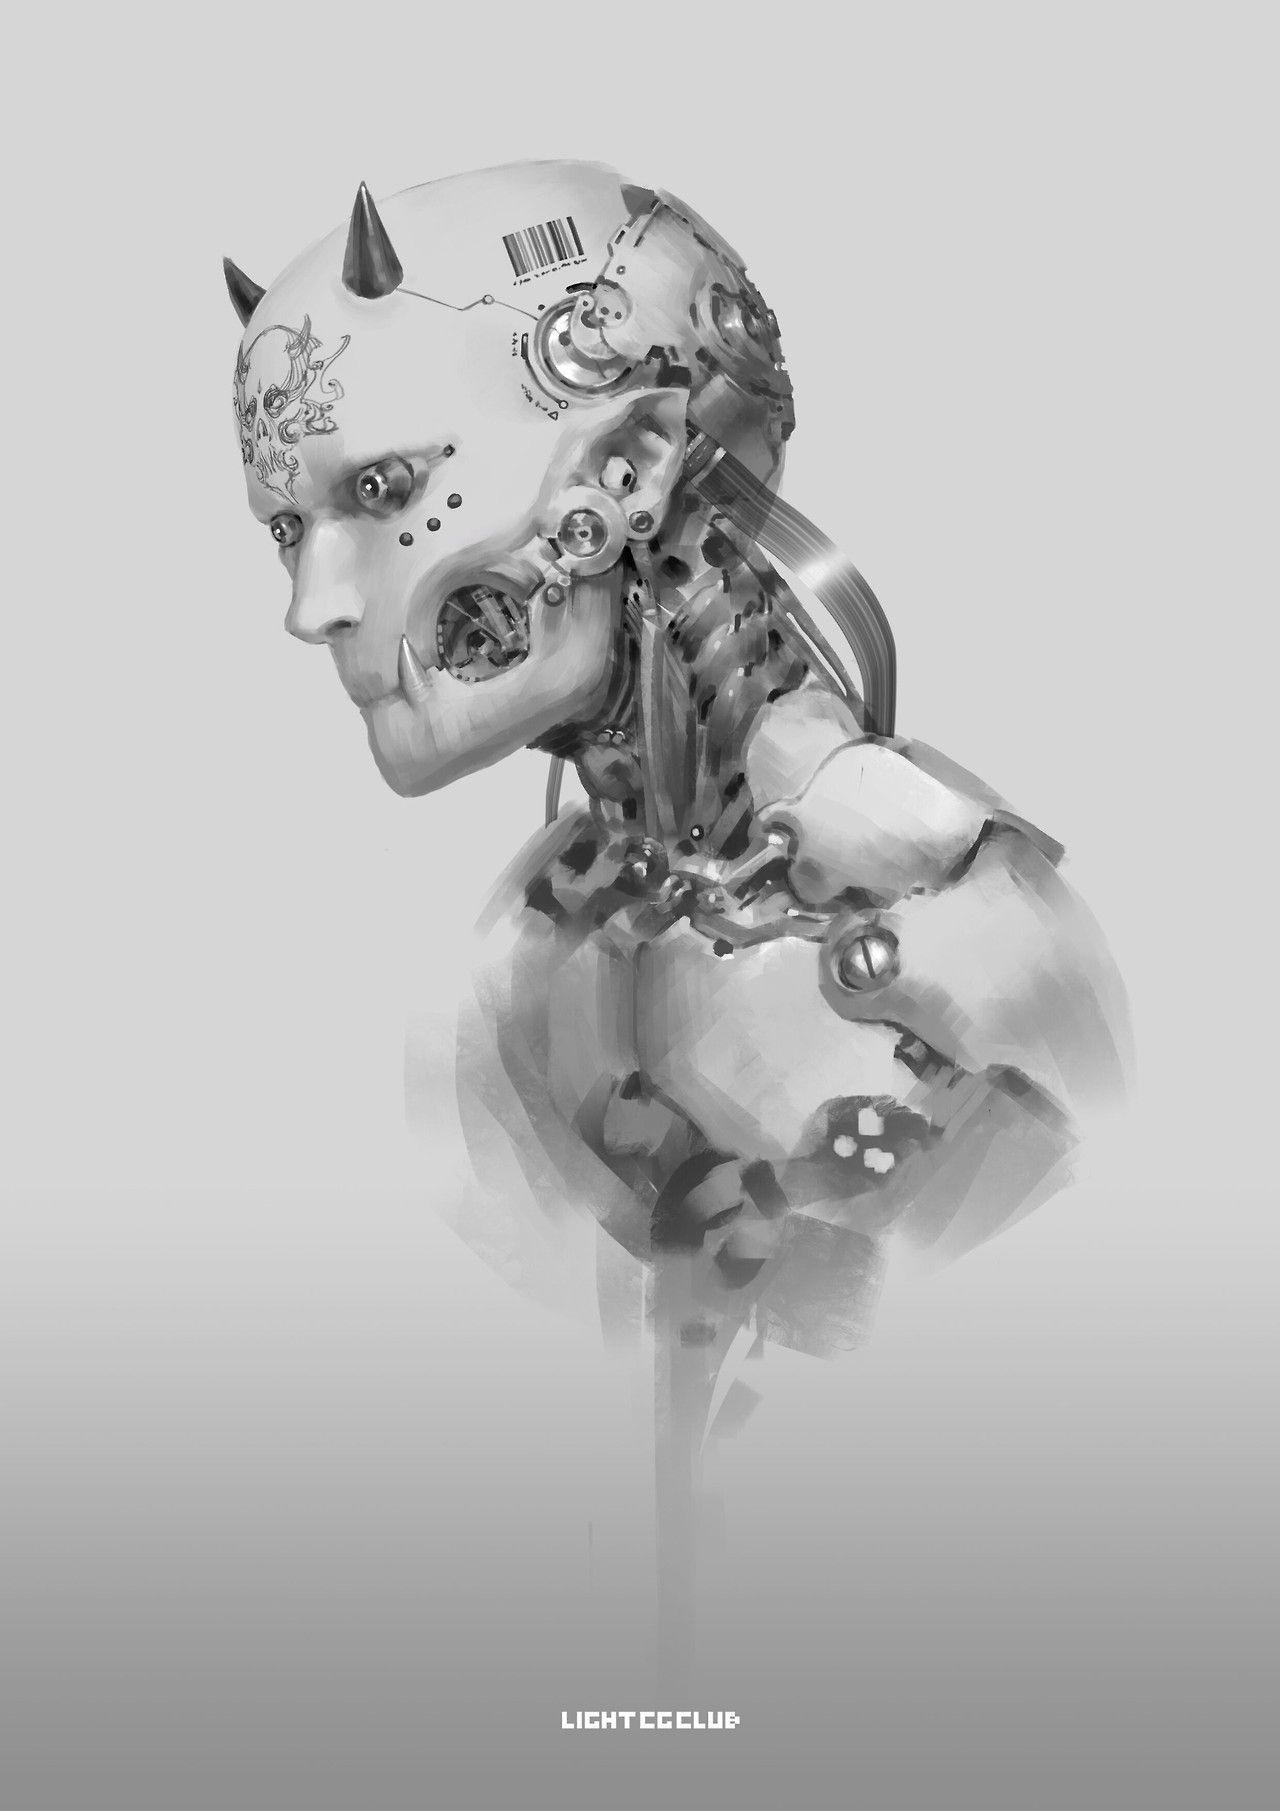 robotics #cyborg #sci_fi #body_horror #wires #cyberpunk #art ...